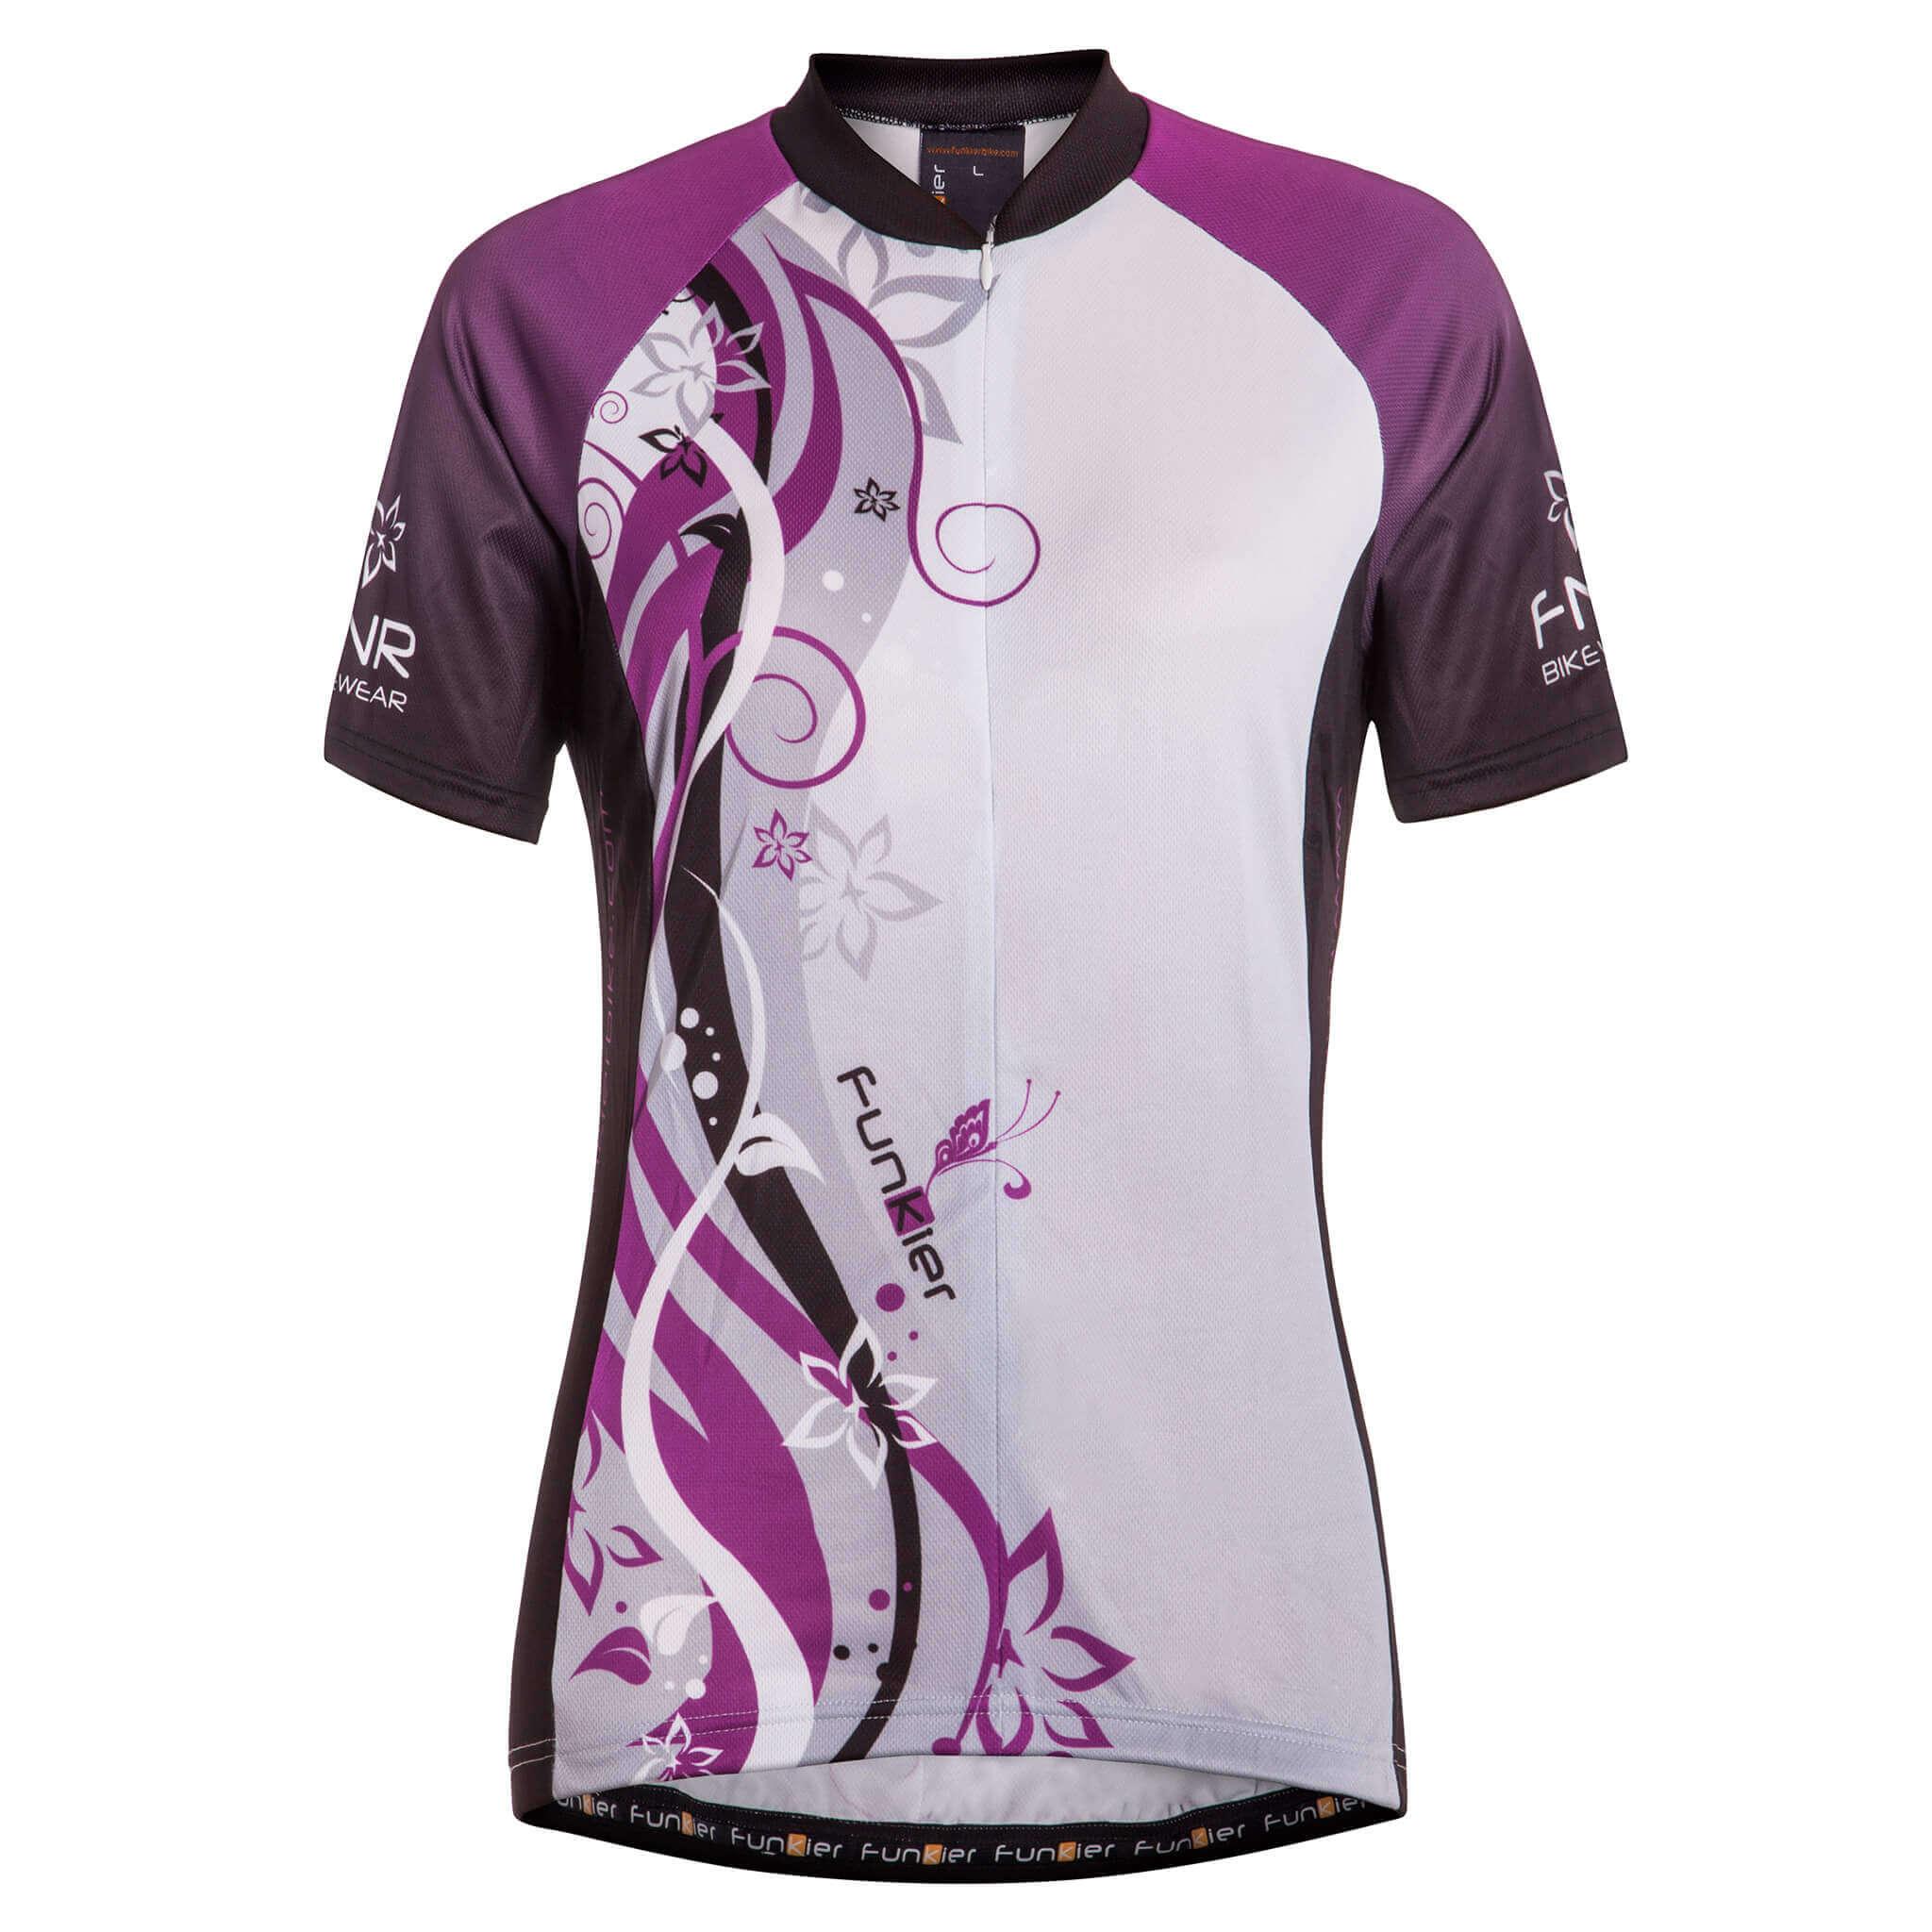 Ladies Short Sleeve Jersey J-383